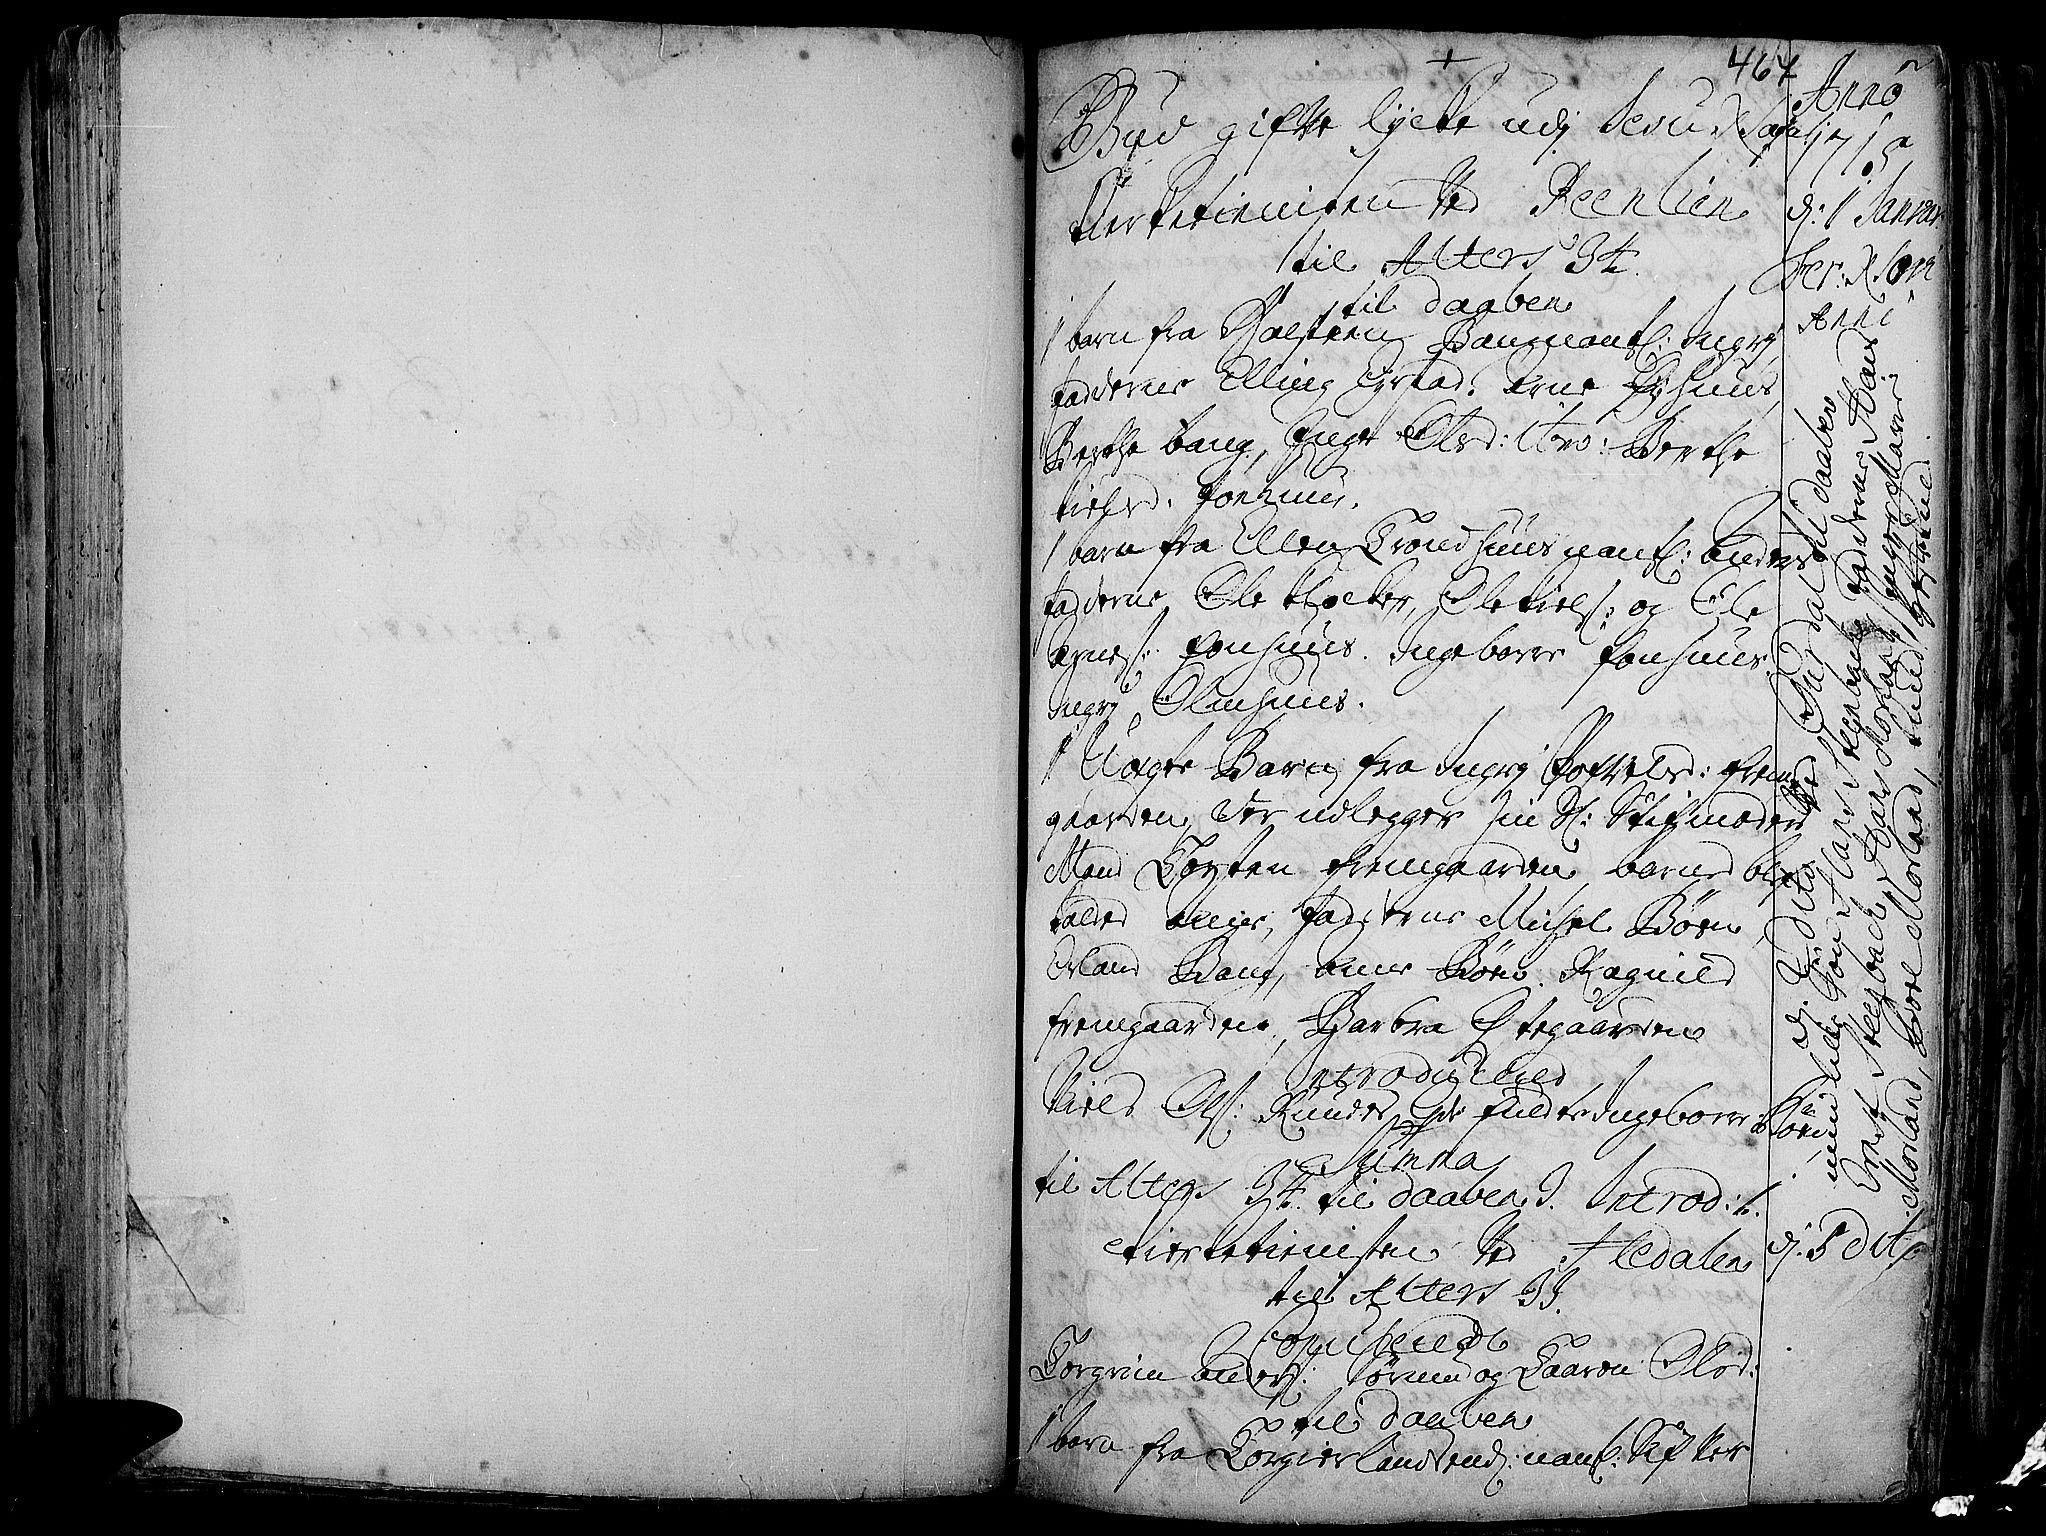 SAH, Aurdal prestekontor, Ministerialbok nr. 1-3, 1692-1730, s. 467